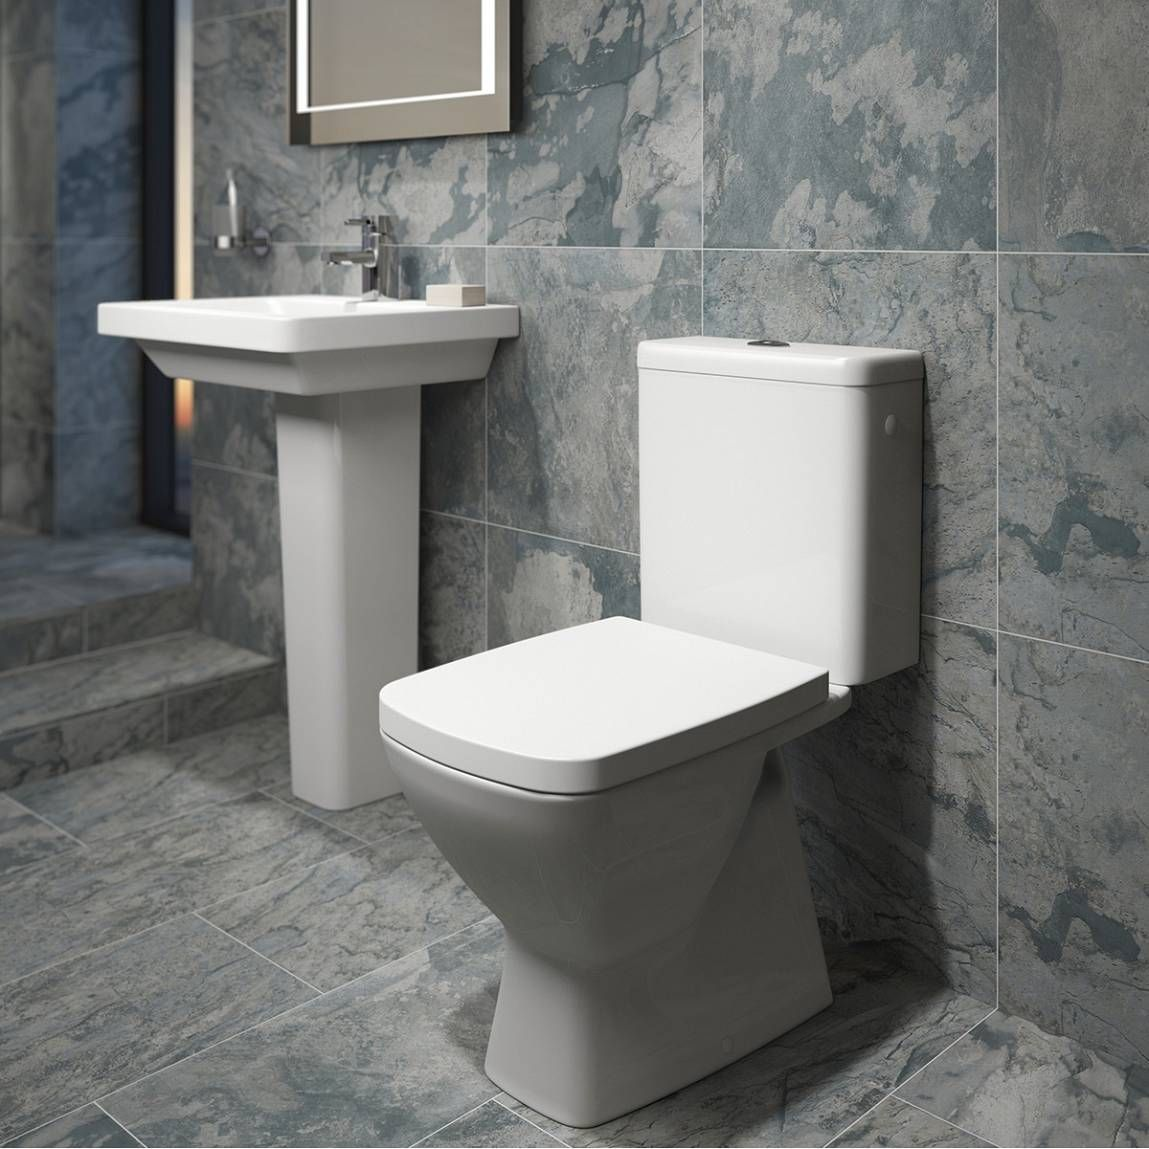 Victoria Plumb floor tiles | Bathroom | Pinterest | Wall tiles ...